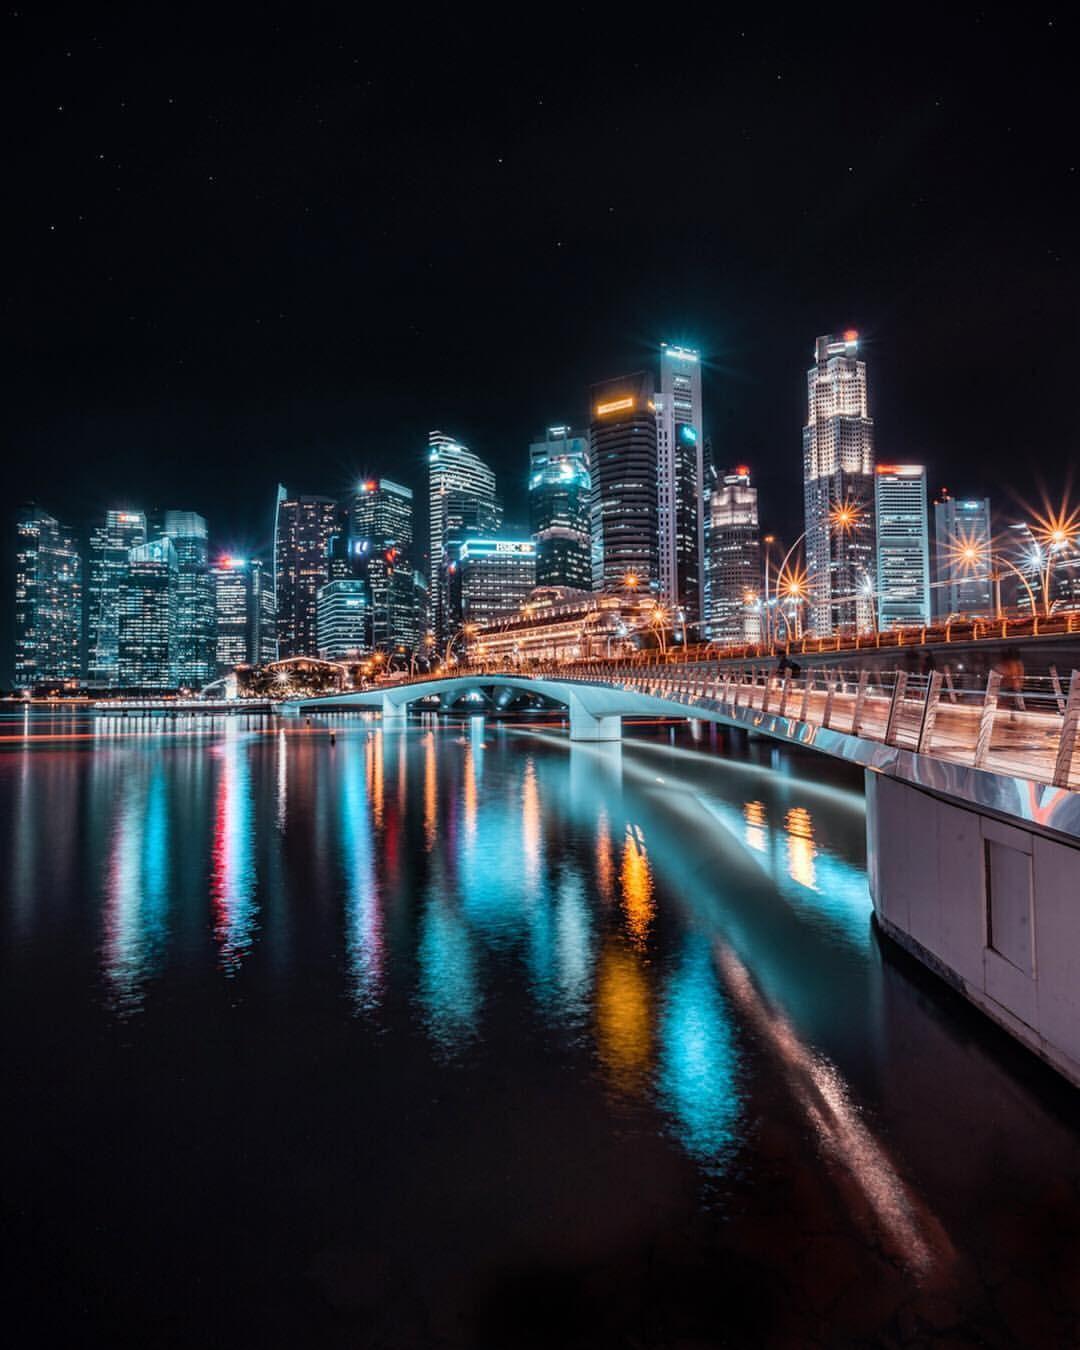 Singapore S Architecture And Urban Landscapes By Benny Tang Singapore Architecture Landscape Photography Urban Landscape